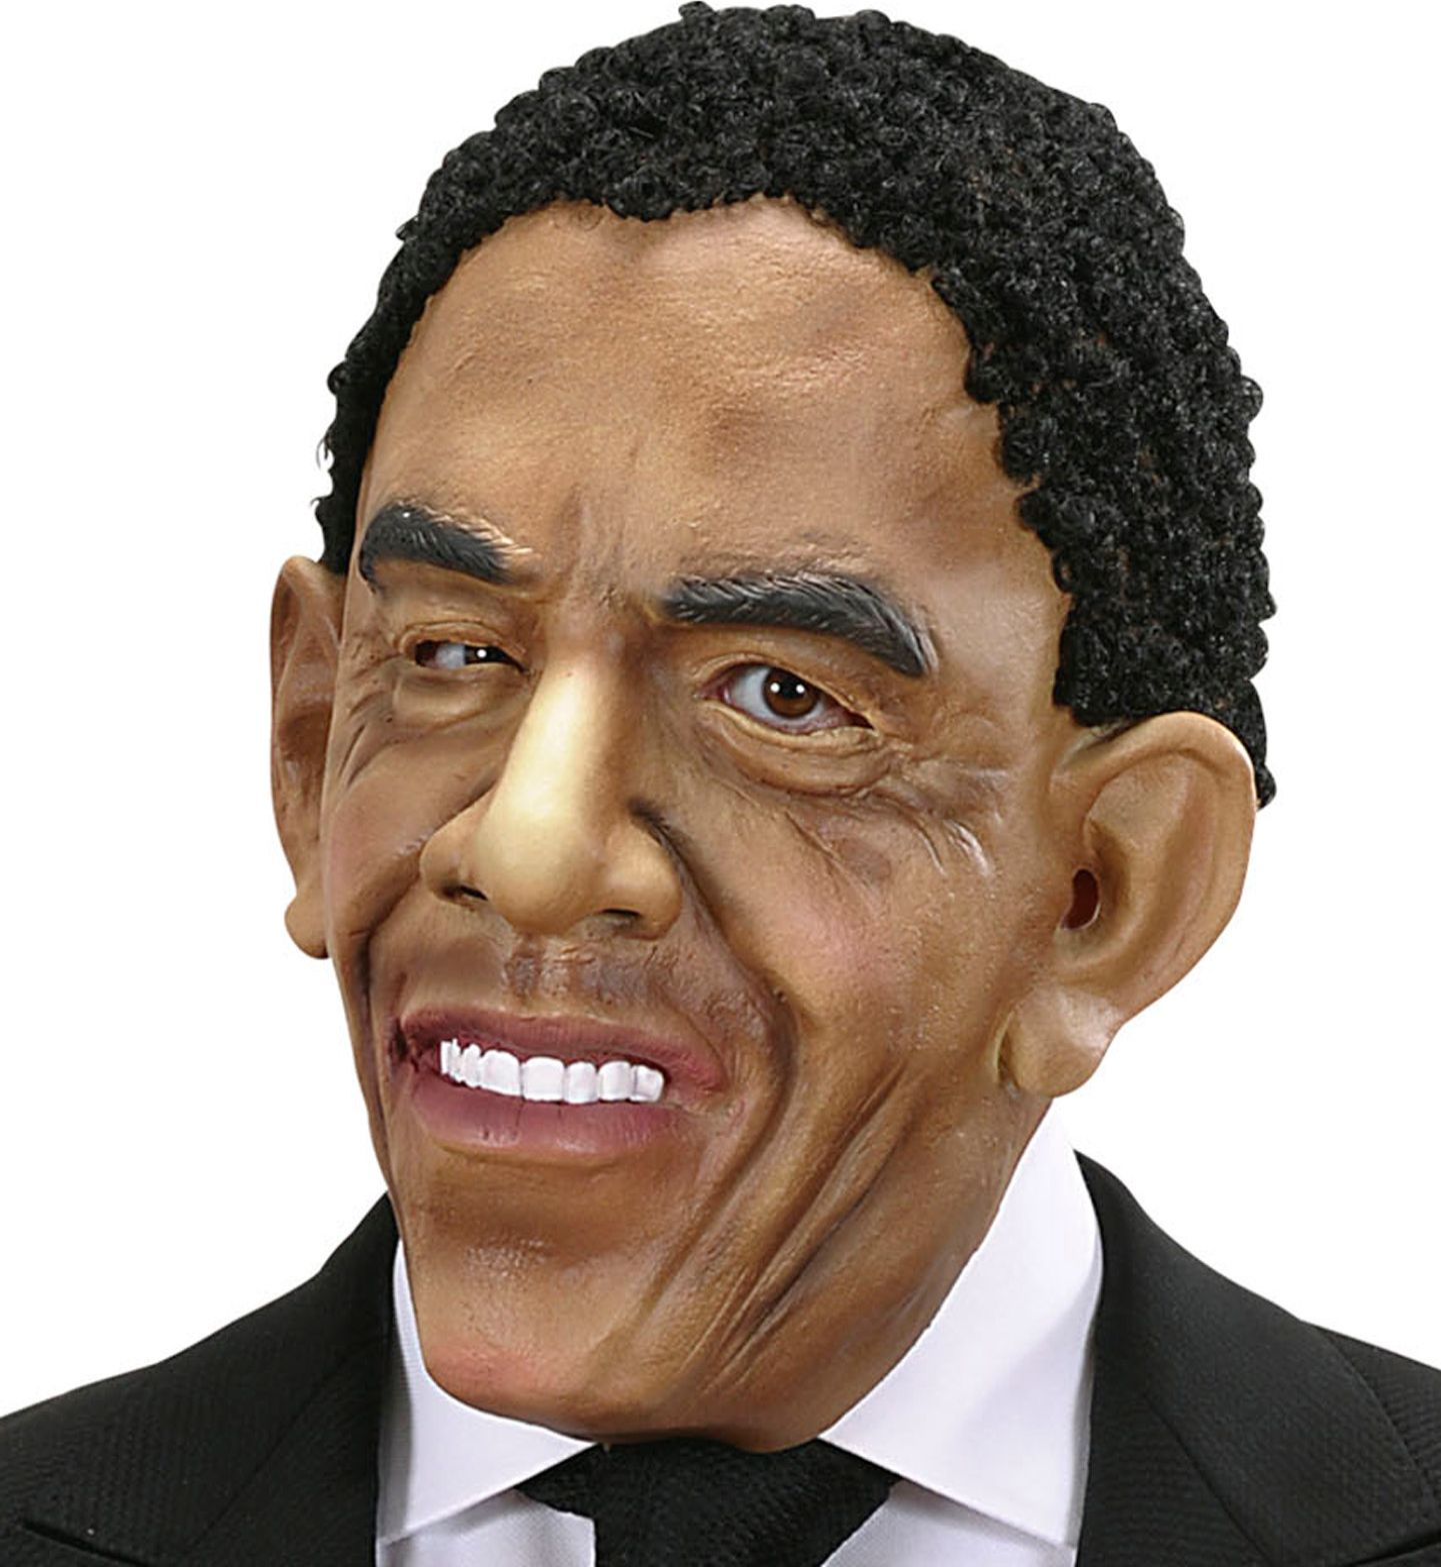 Obama masker met haar